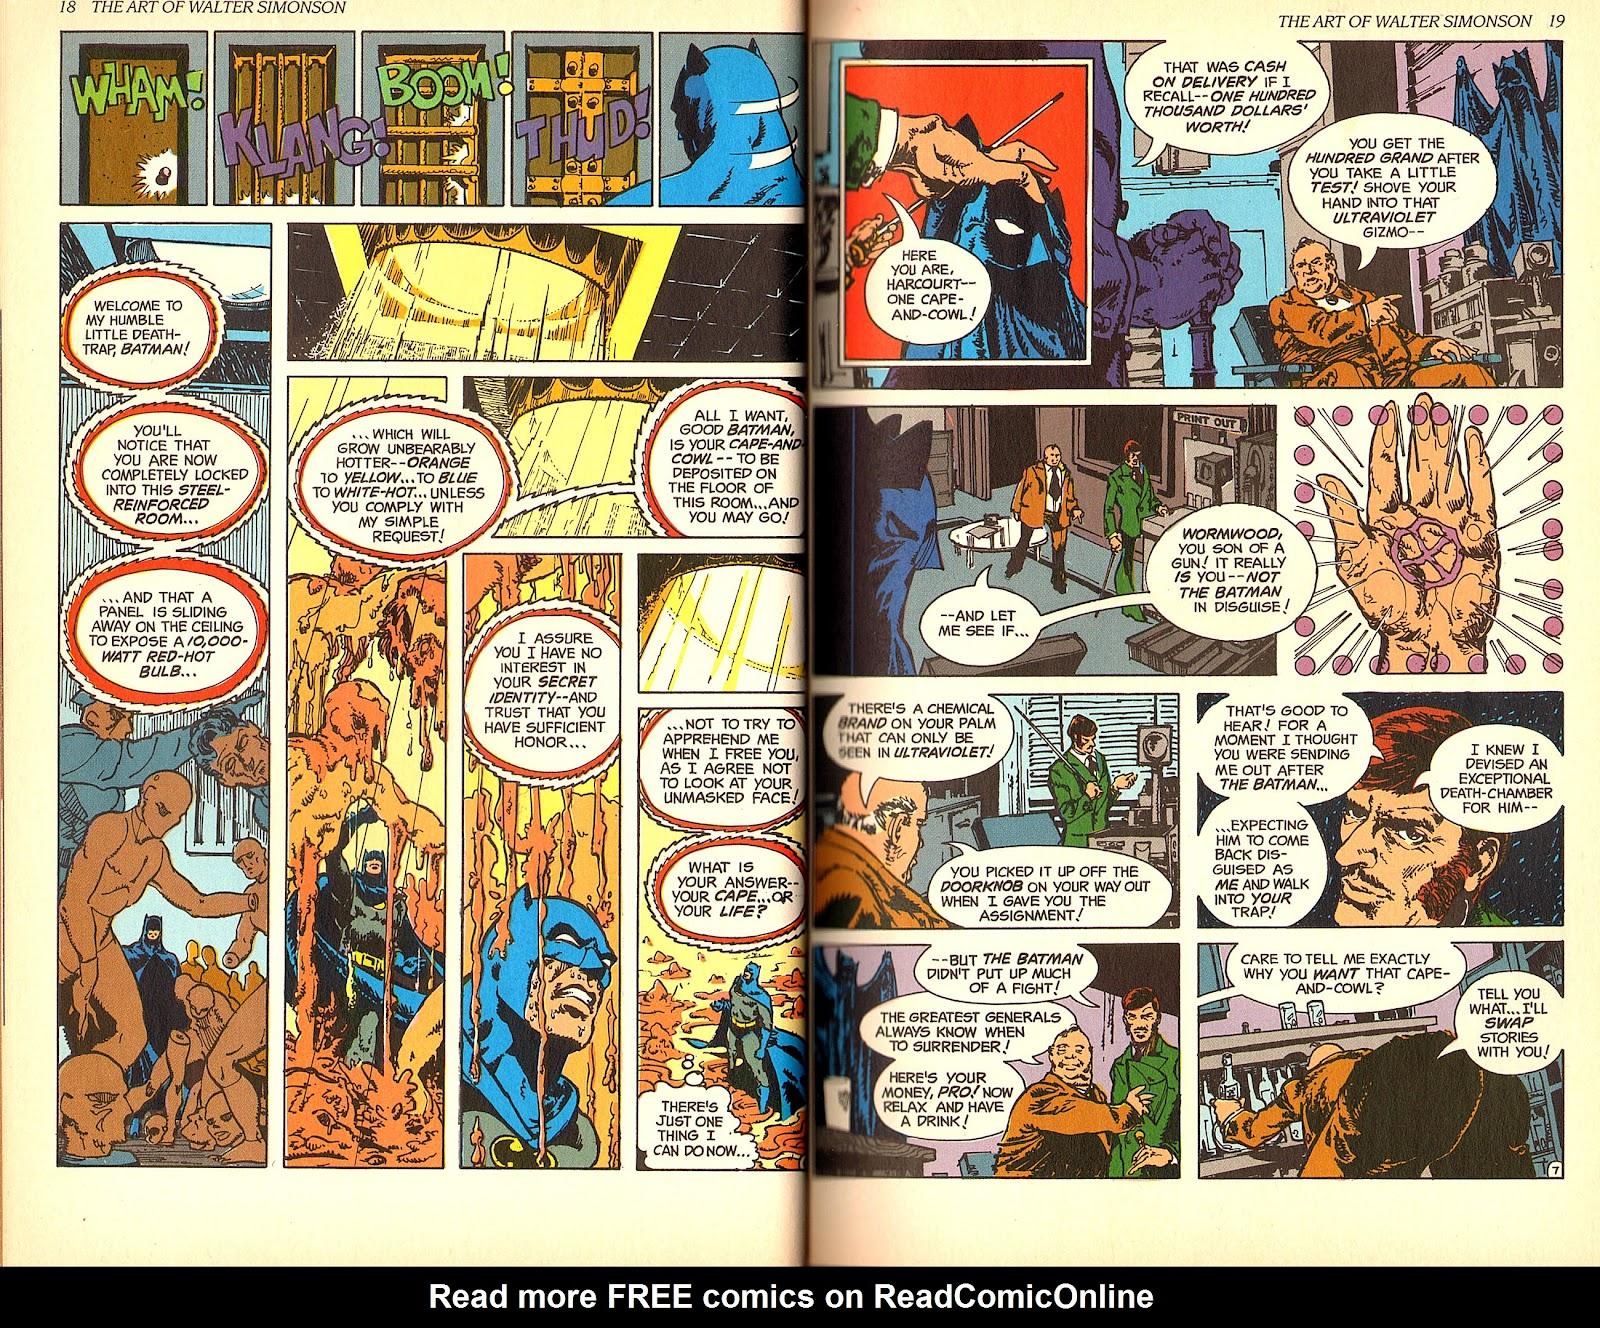 Read online The Art of Walter Simonson comic -  Issue # TPB - 11